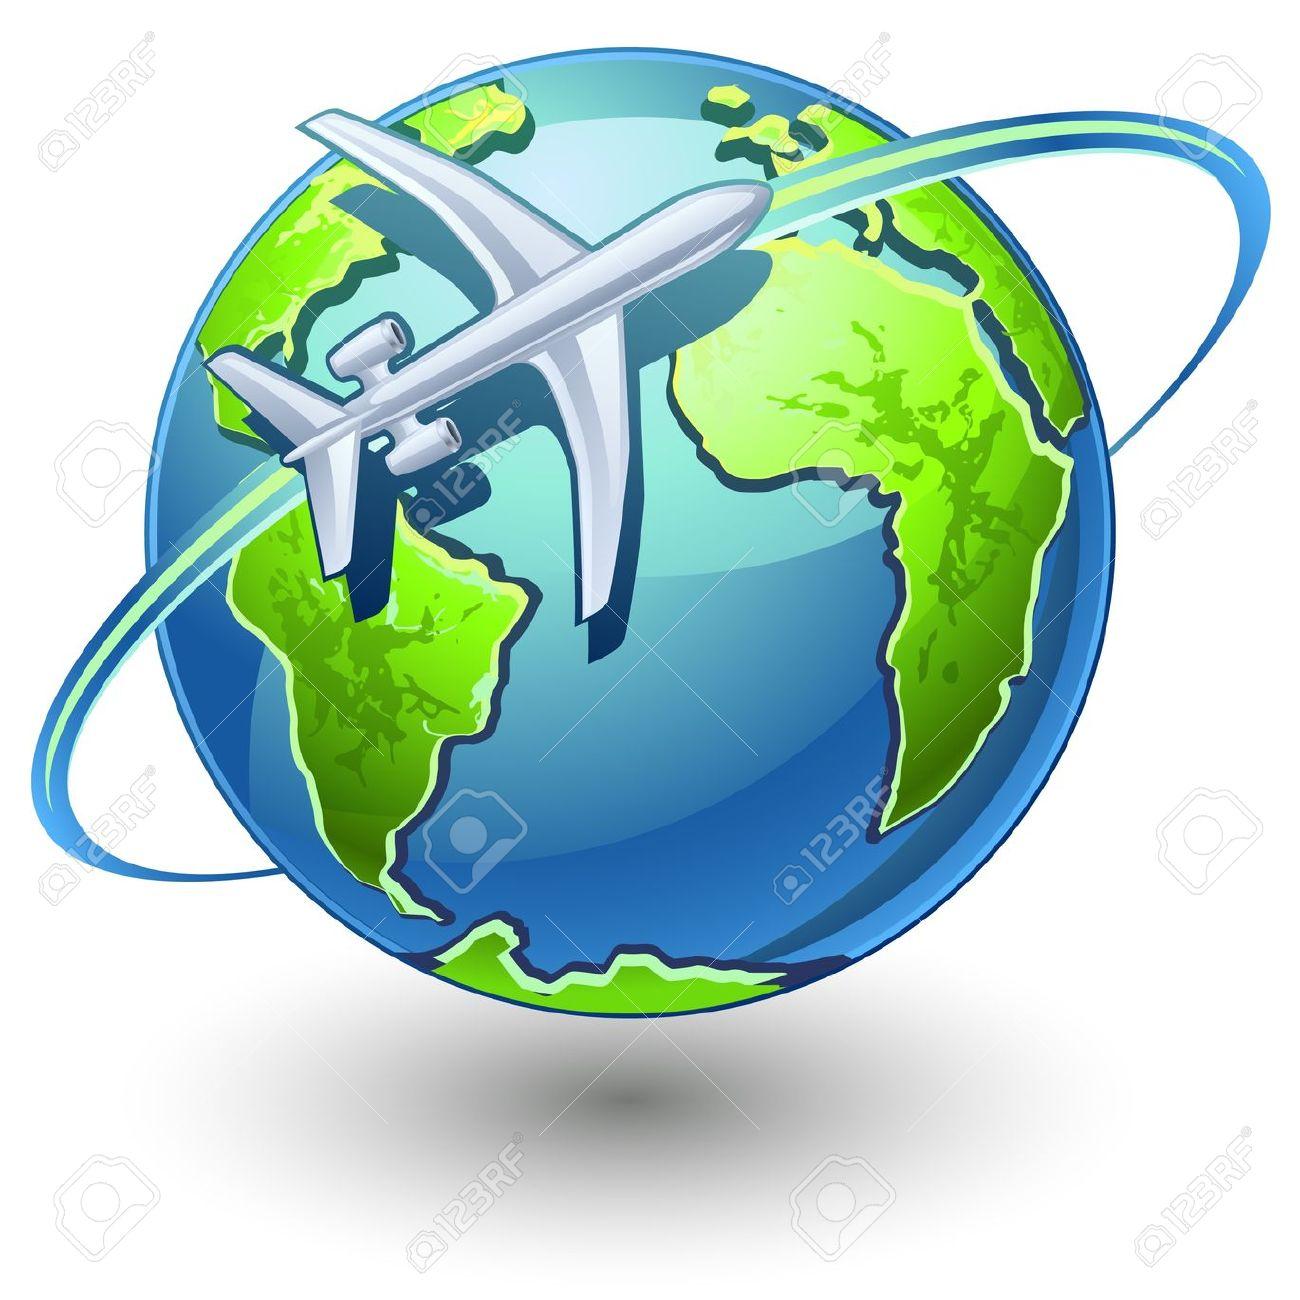 1300x1300 Plane globe clipart, explore pictures